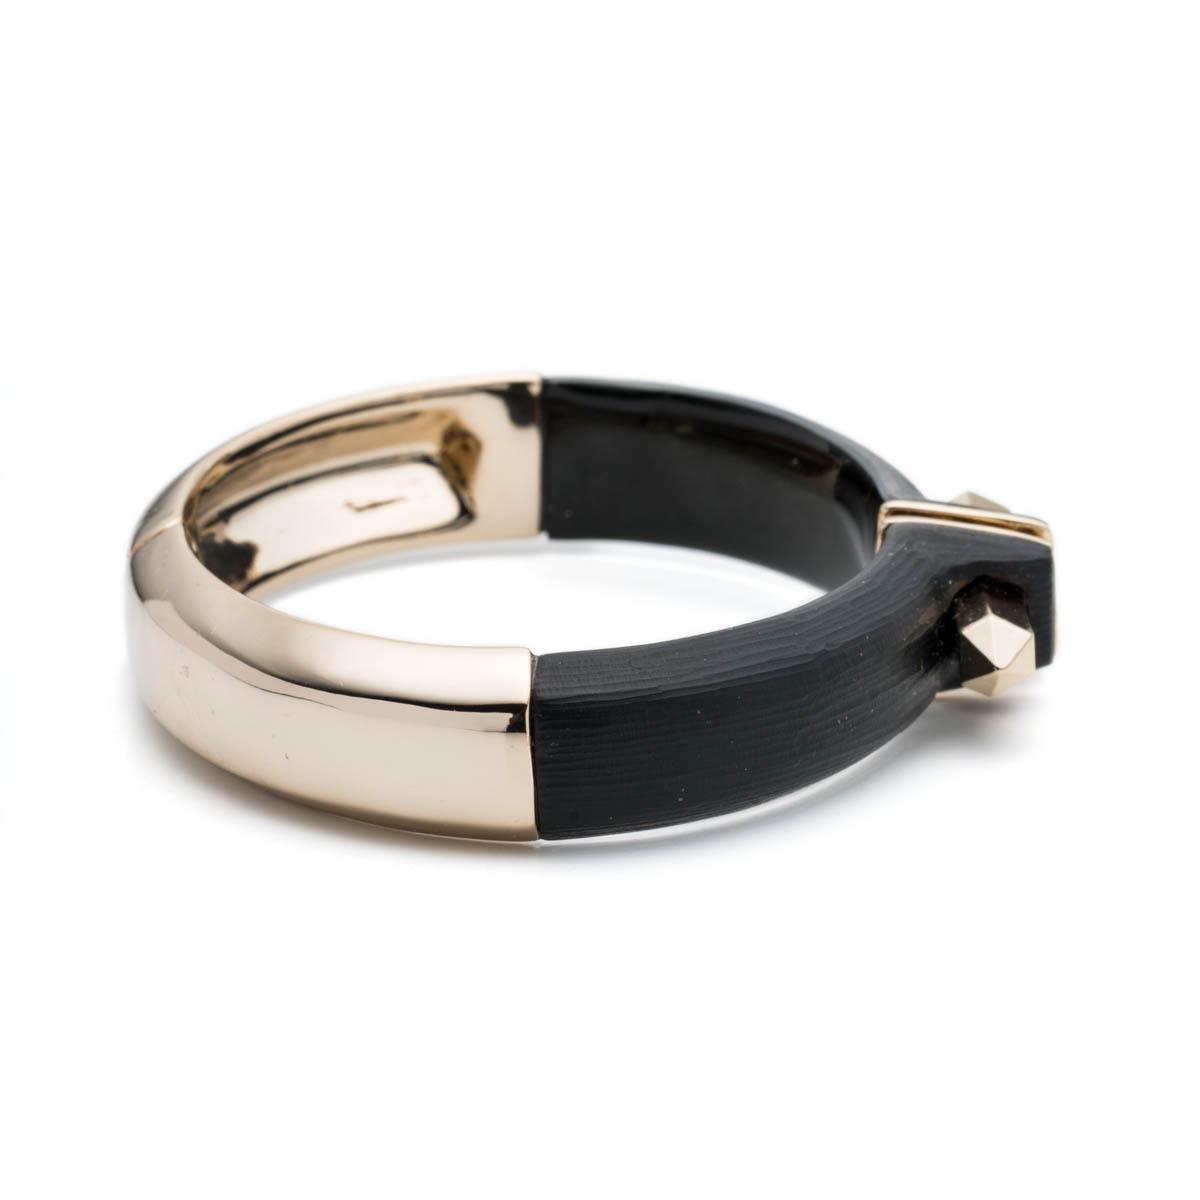 Alexis bittar Small Pierced Crystal Hinge Bracelet You ...